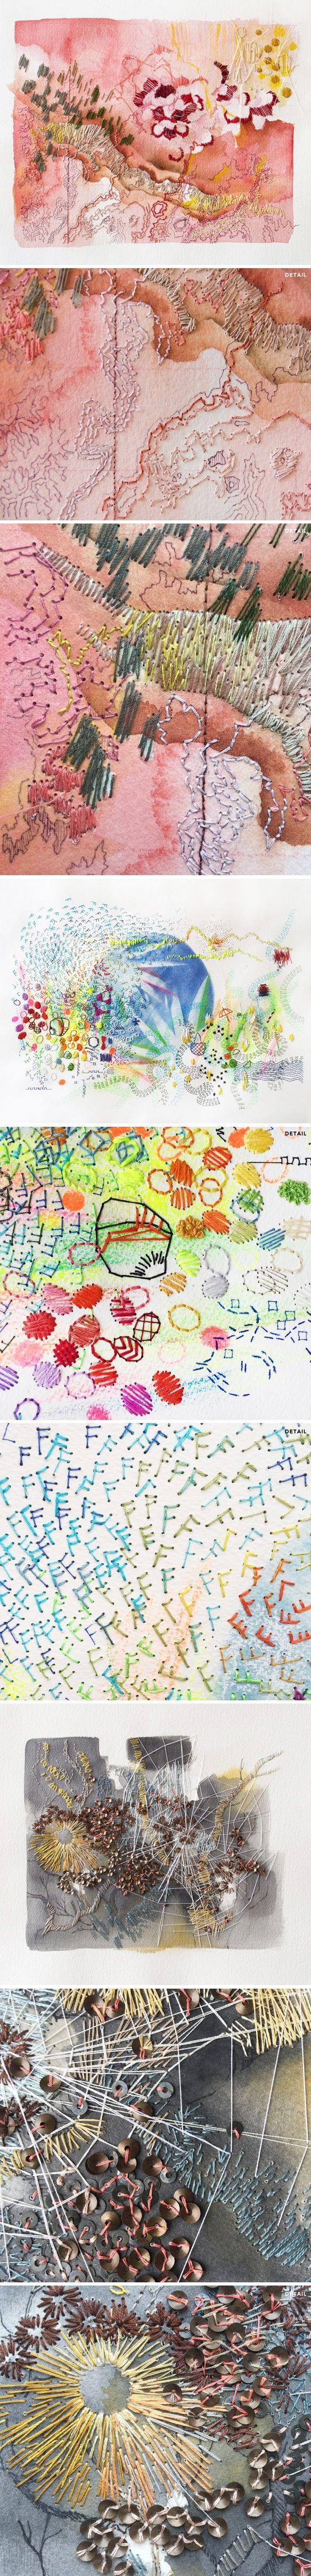 rhian swierat (painting + embroidery)